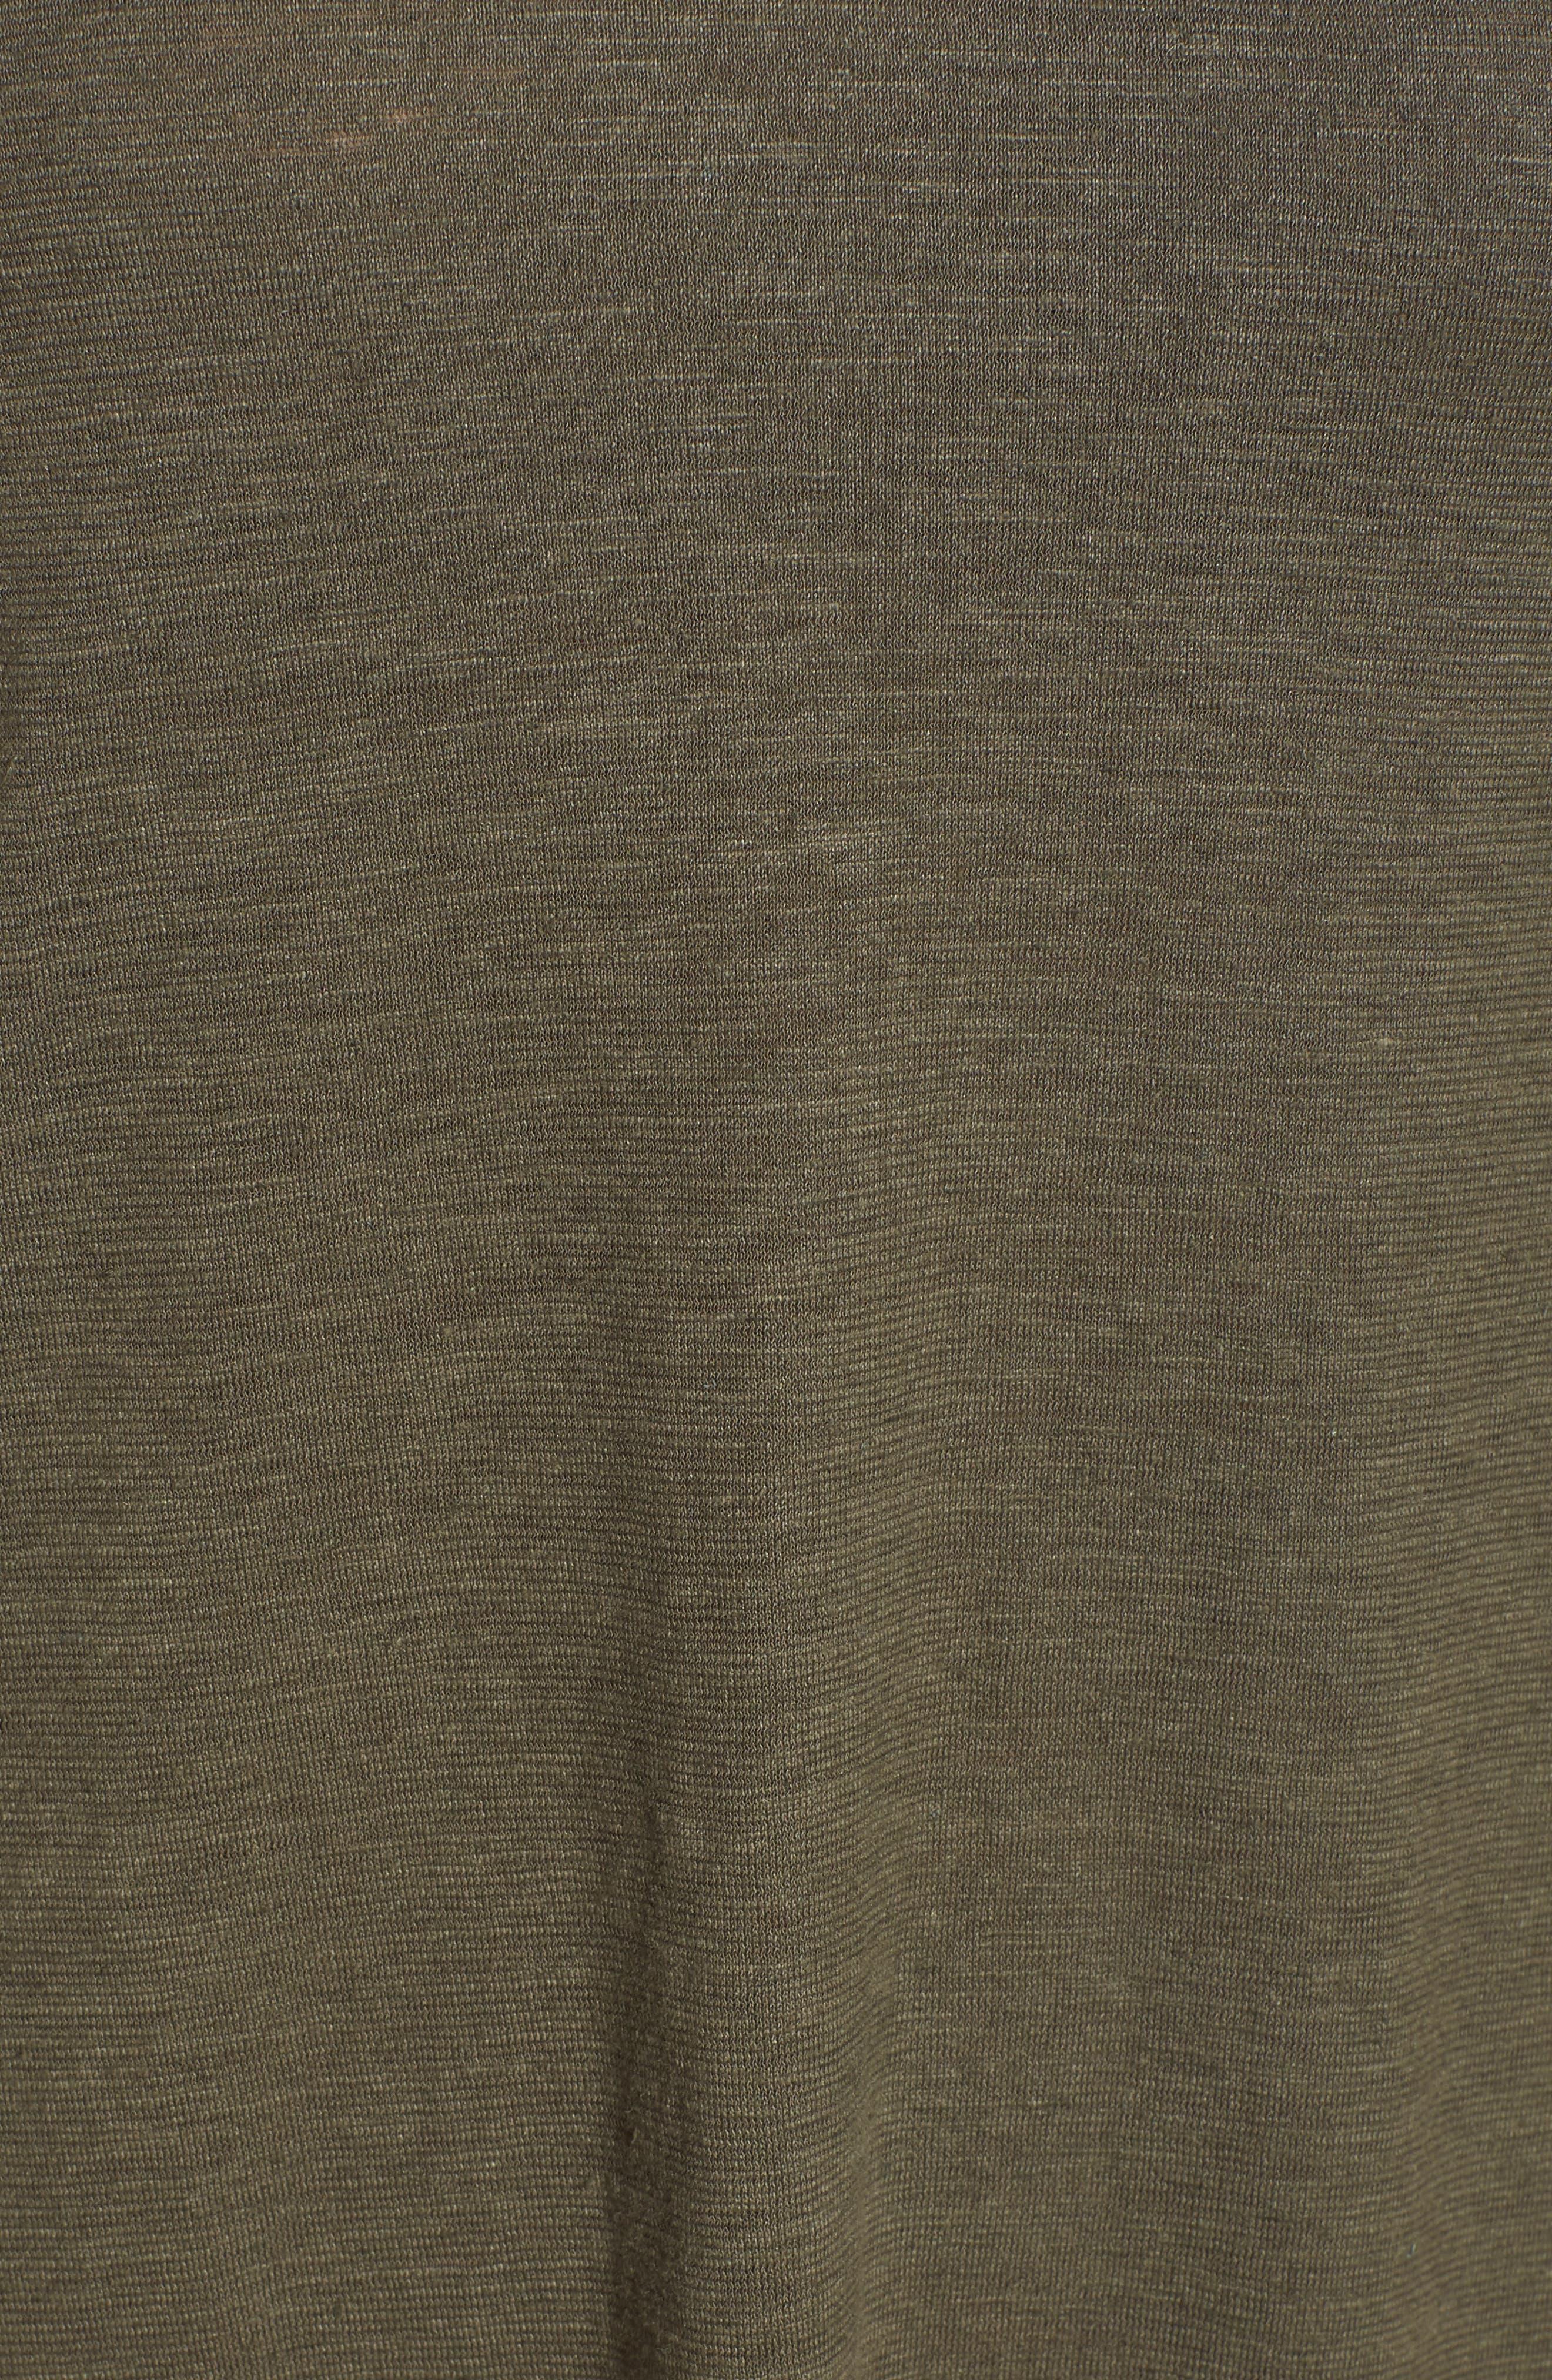 Asymmetrical Hemp Blend Shift Dress,                             Alternate thumbnail 6, color,                             359